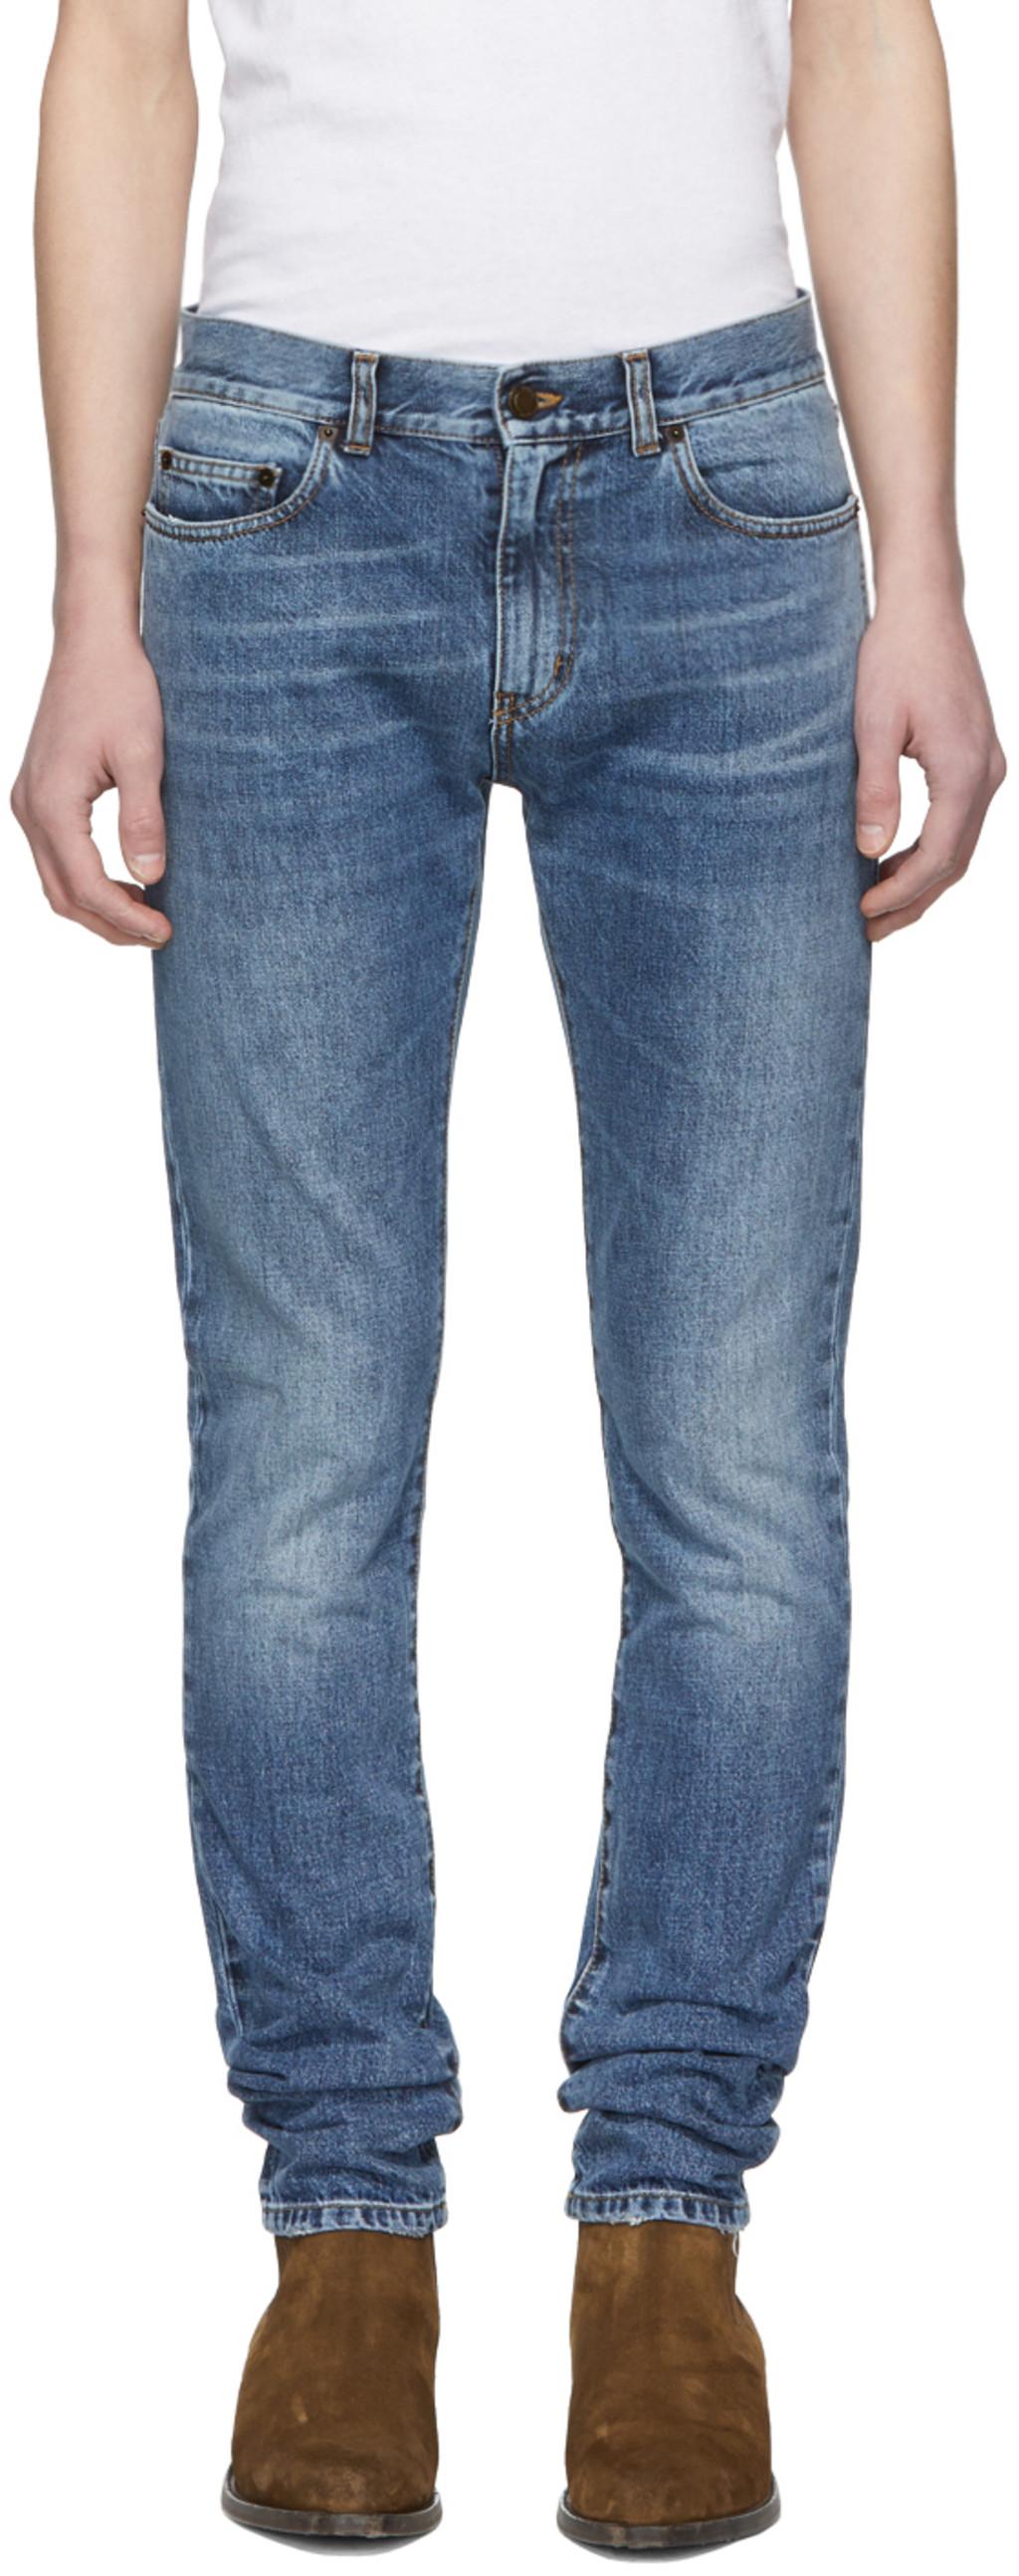 1770853bcf Blue Skinny Jeans